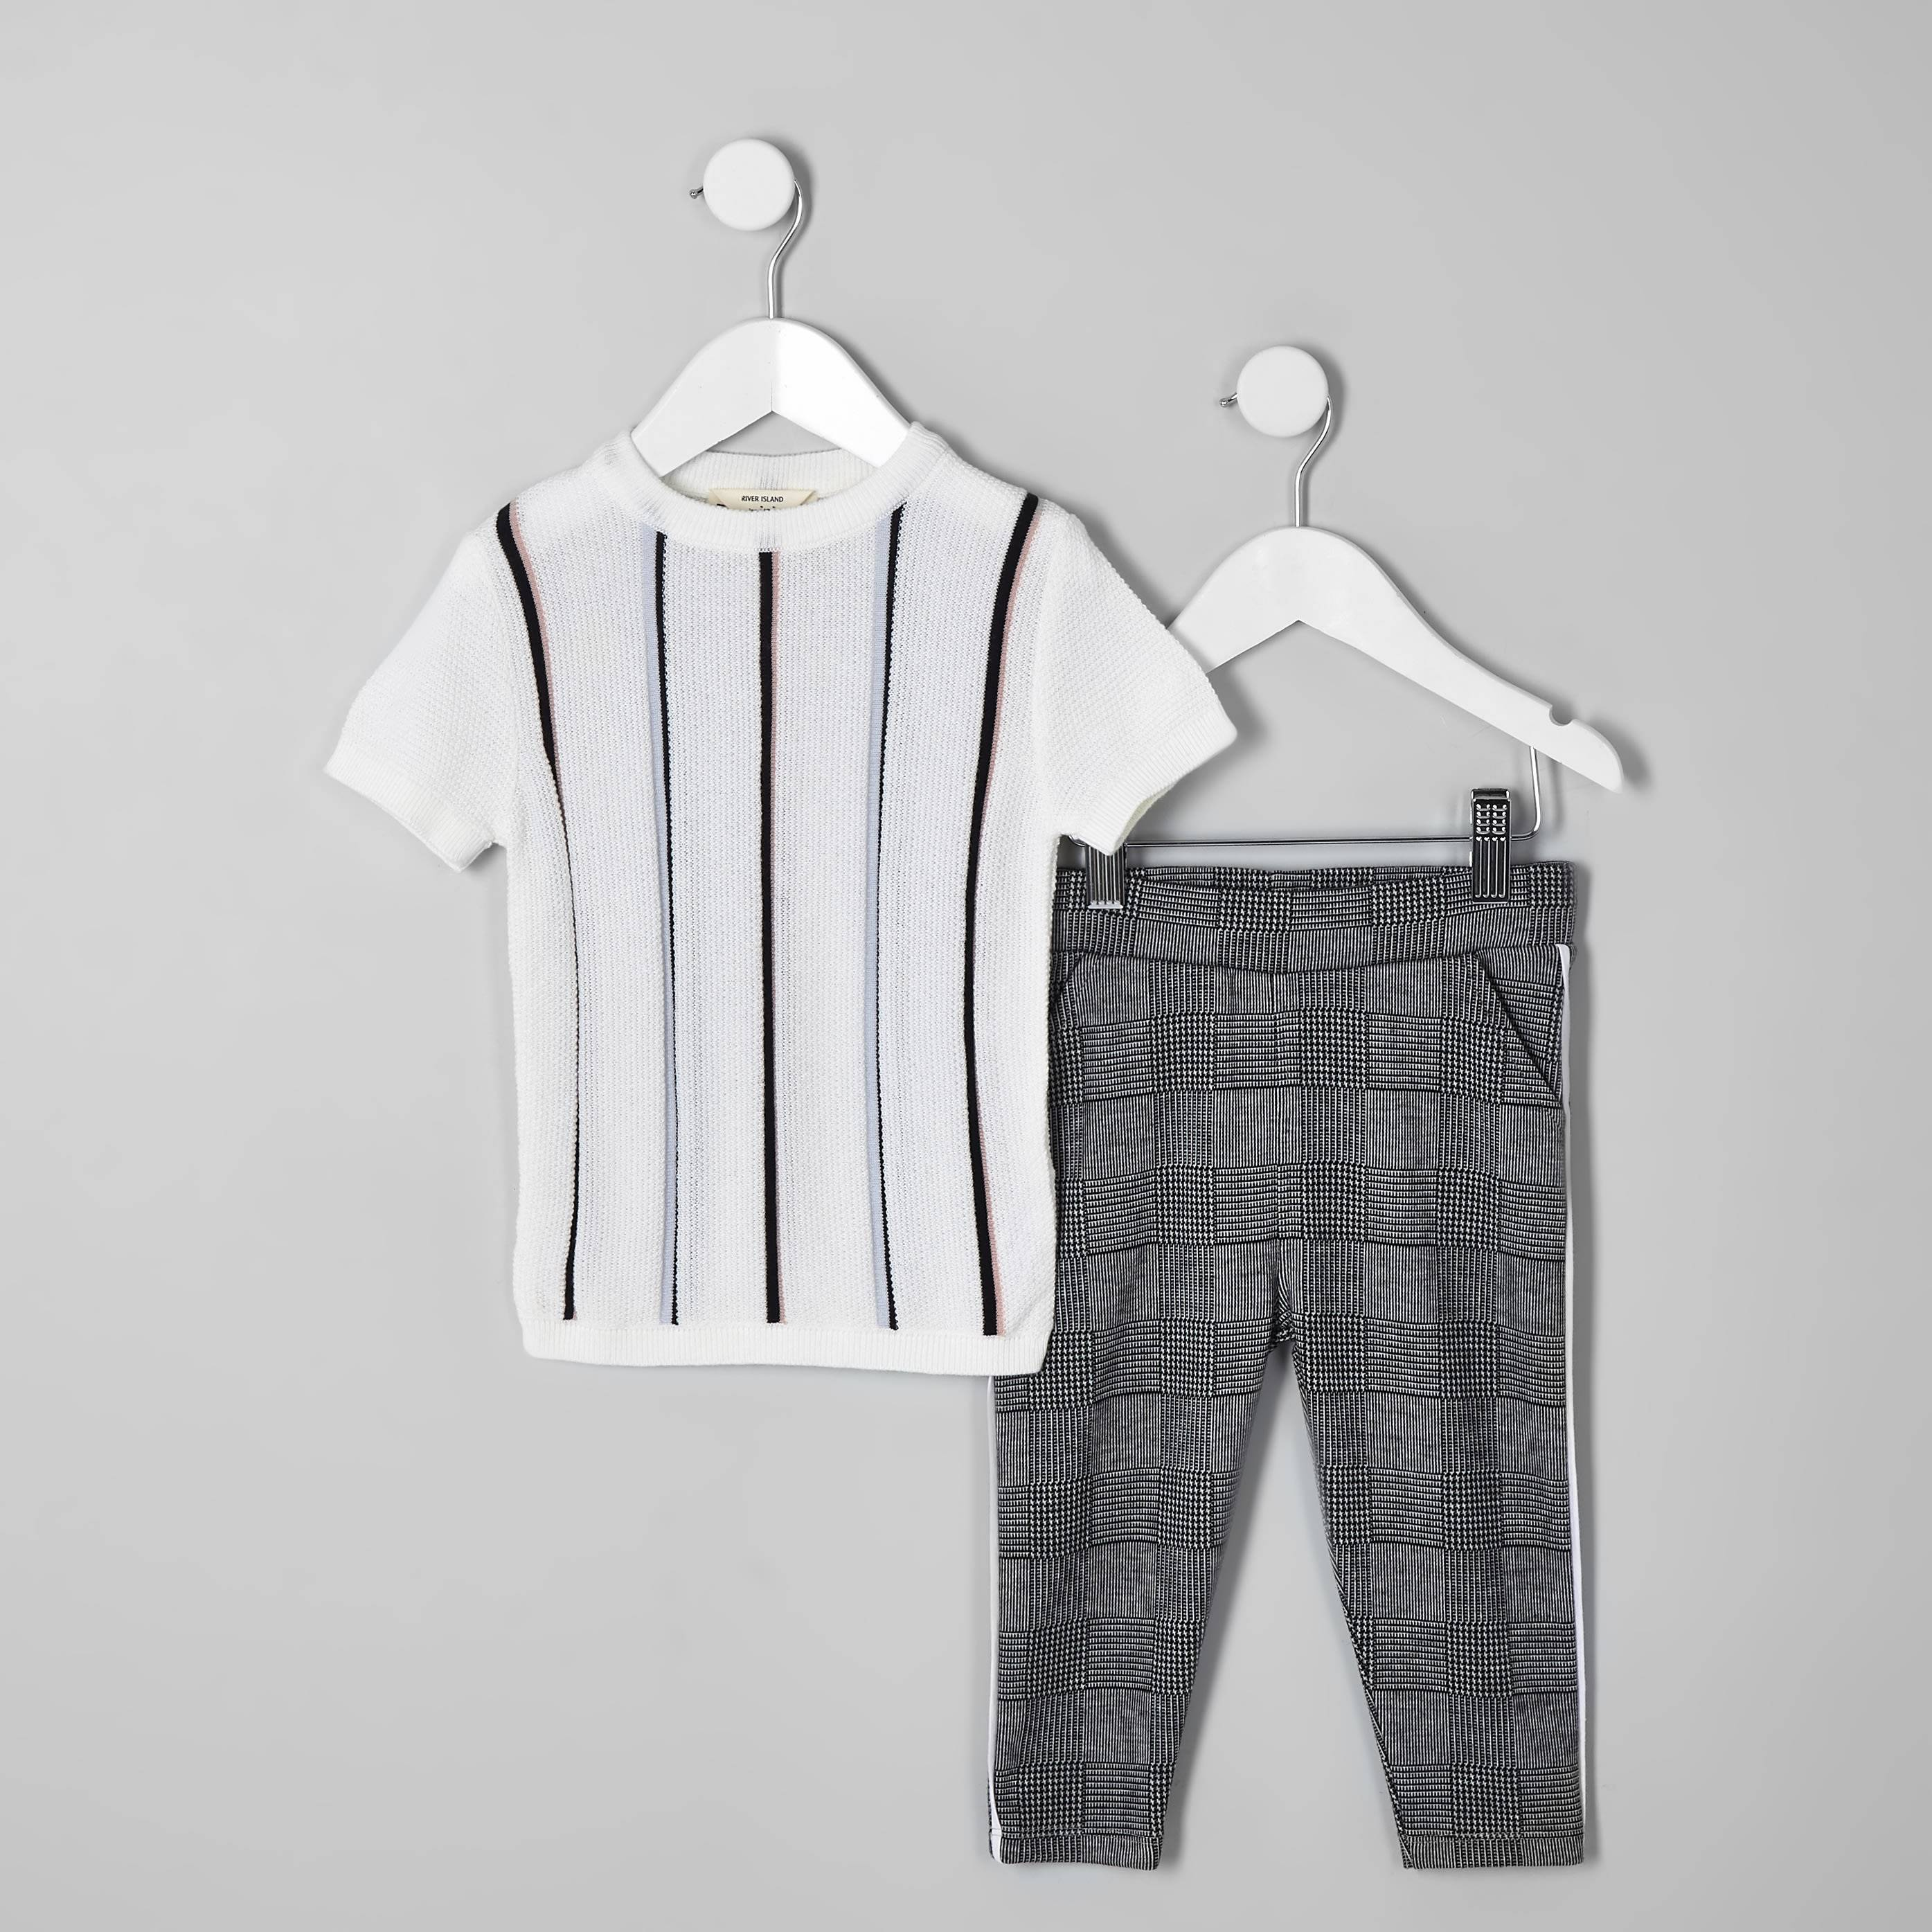 River Island Mens Baby Boys ecru stripe T-shirt outfit (3-6 Mths)